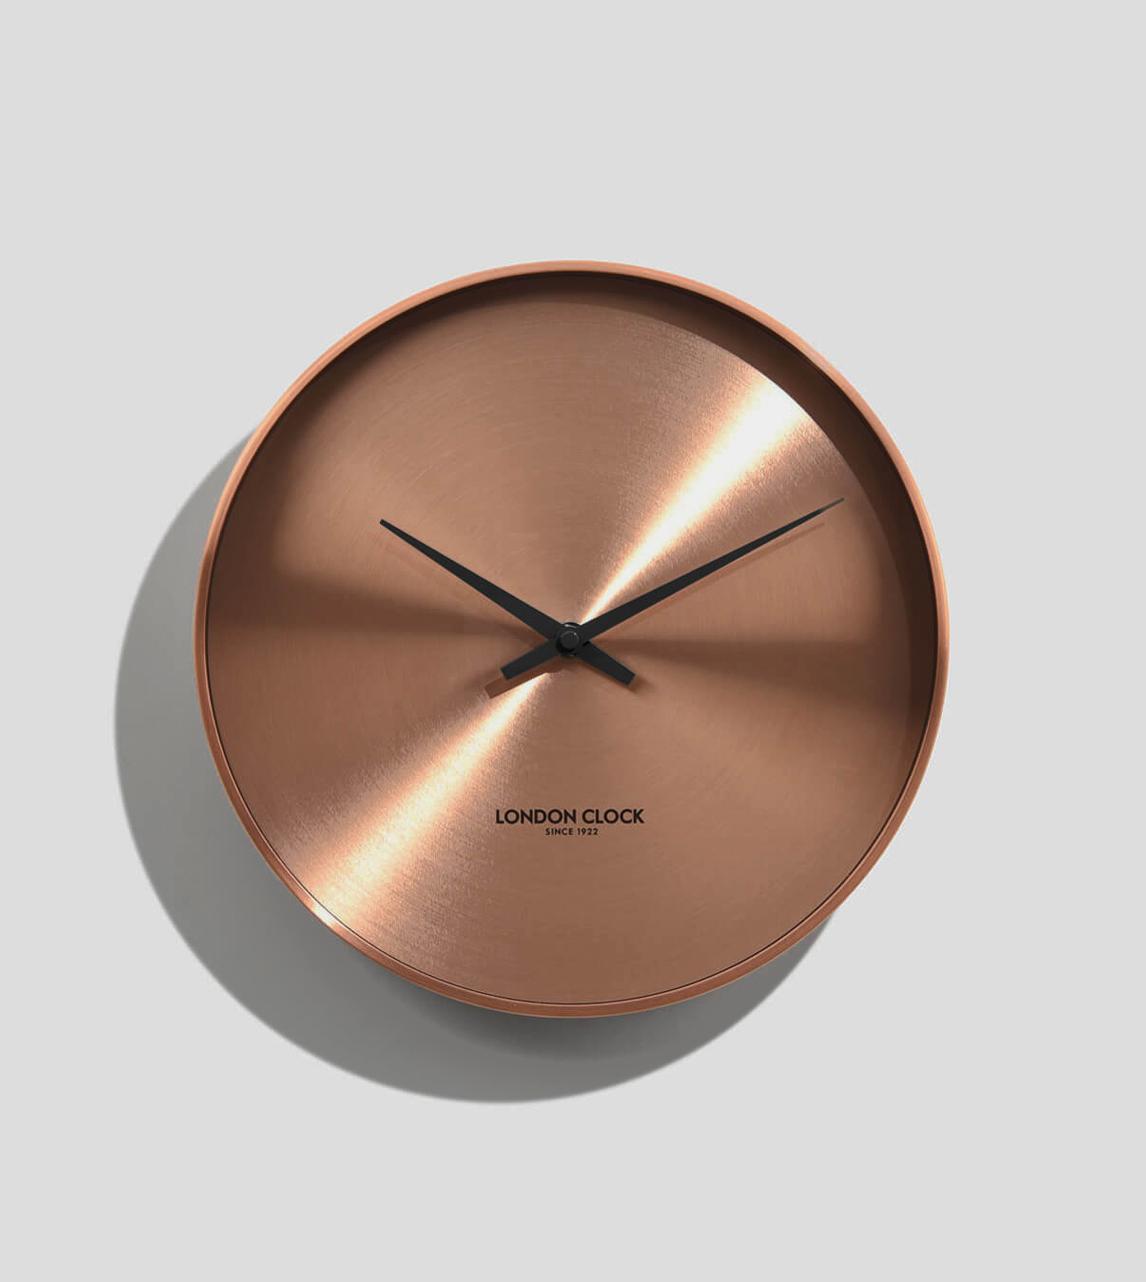 London Clock Element Copper London Clock Company Swoon